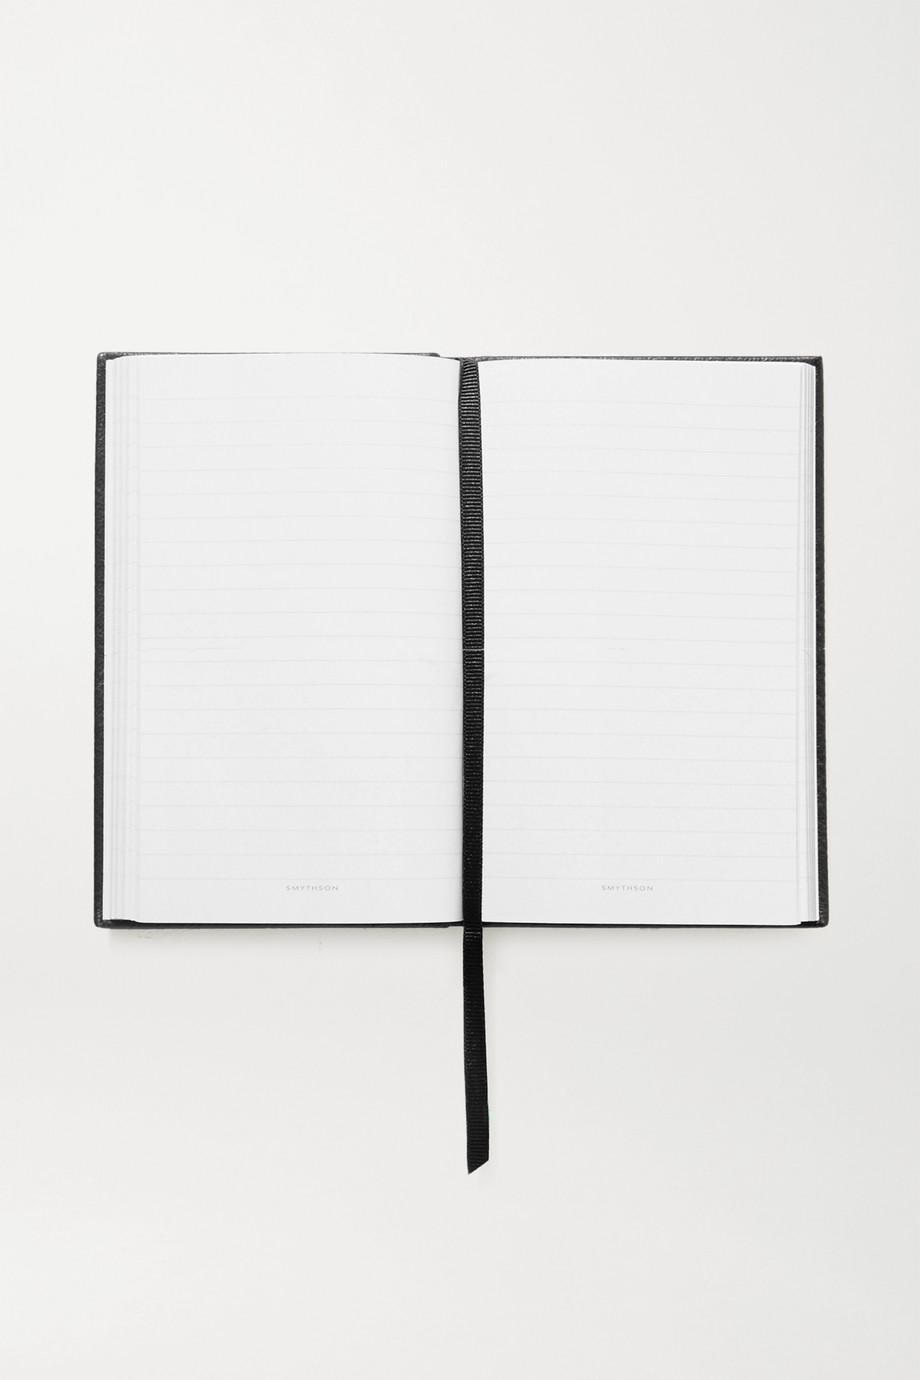 Smythson + NET-A-PORTER Notizbuch aus strukturiertem Leder